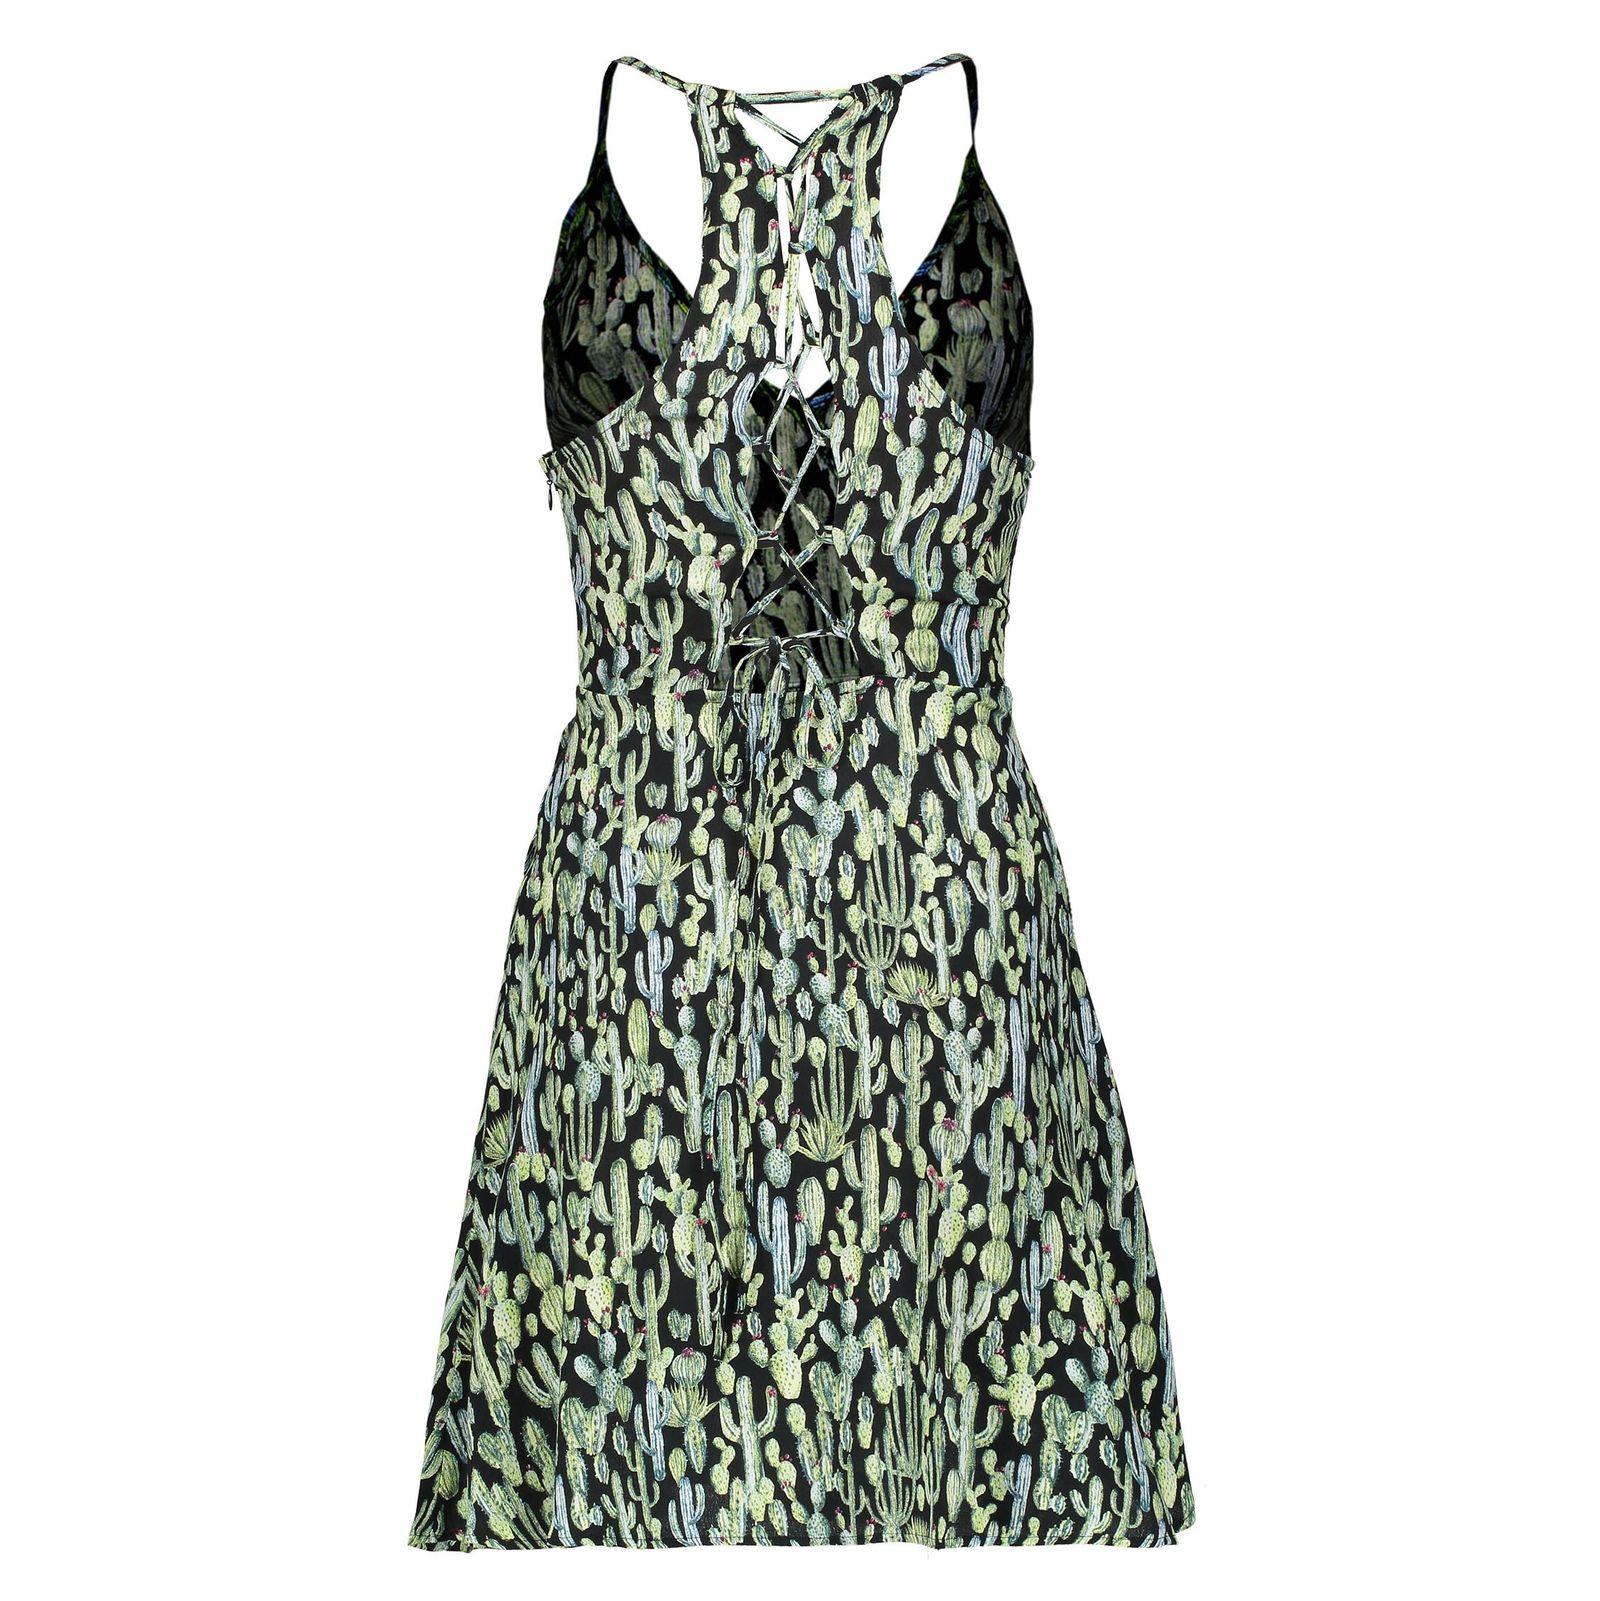 پیراهن ویسکوز زنانه - مانگو - سبز - 2